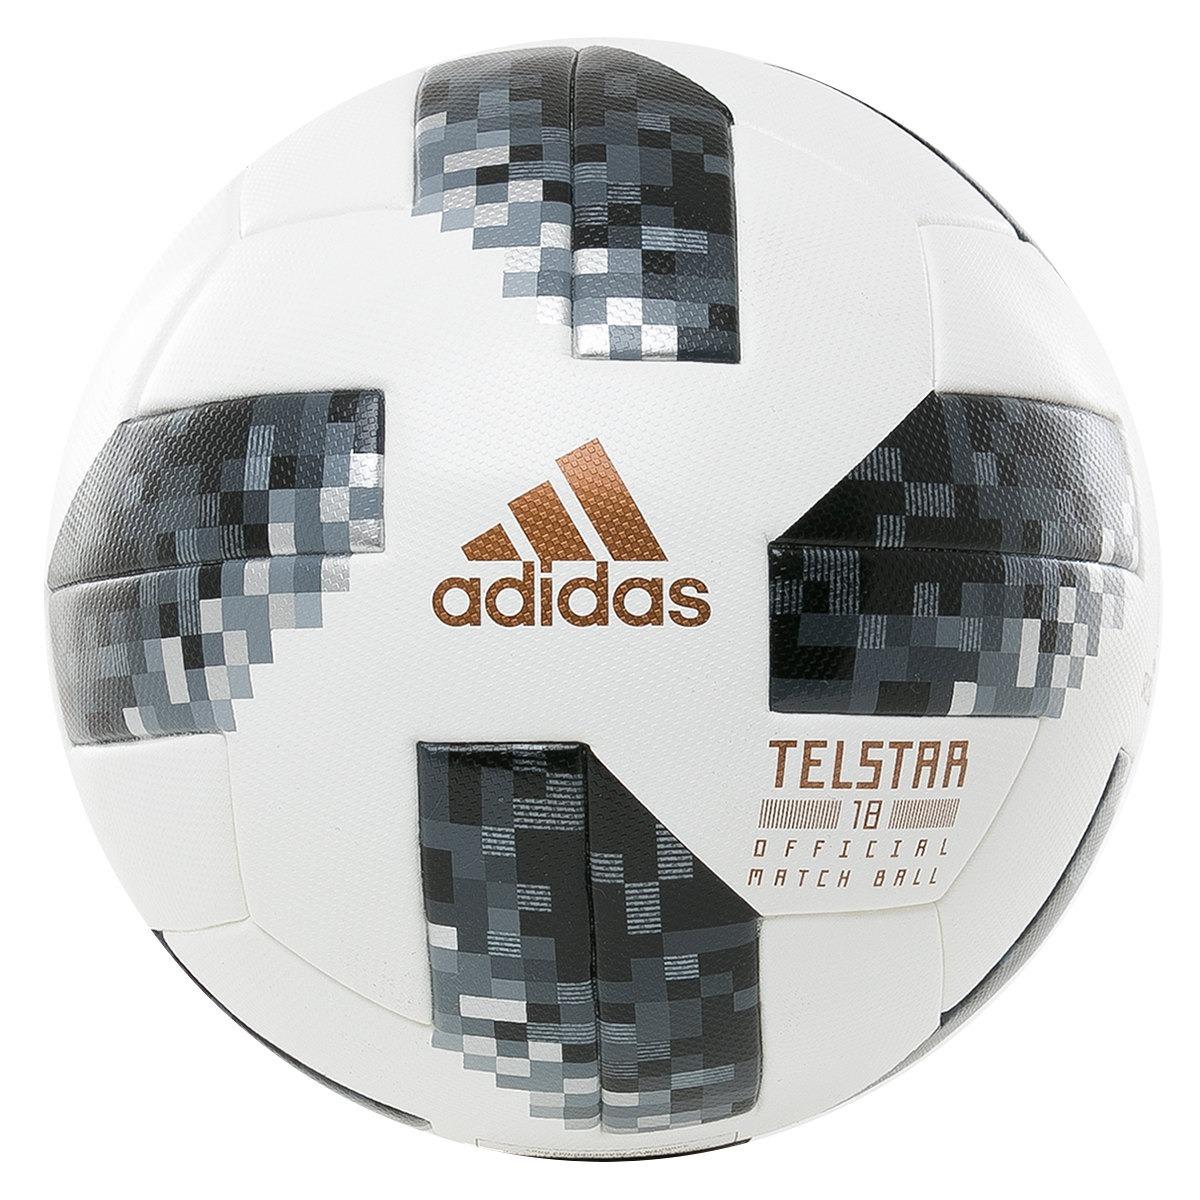 3f83965d08958 pelota telstar 18 oficial fifa world cup omb adidas. Cargando zoom.